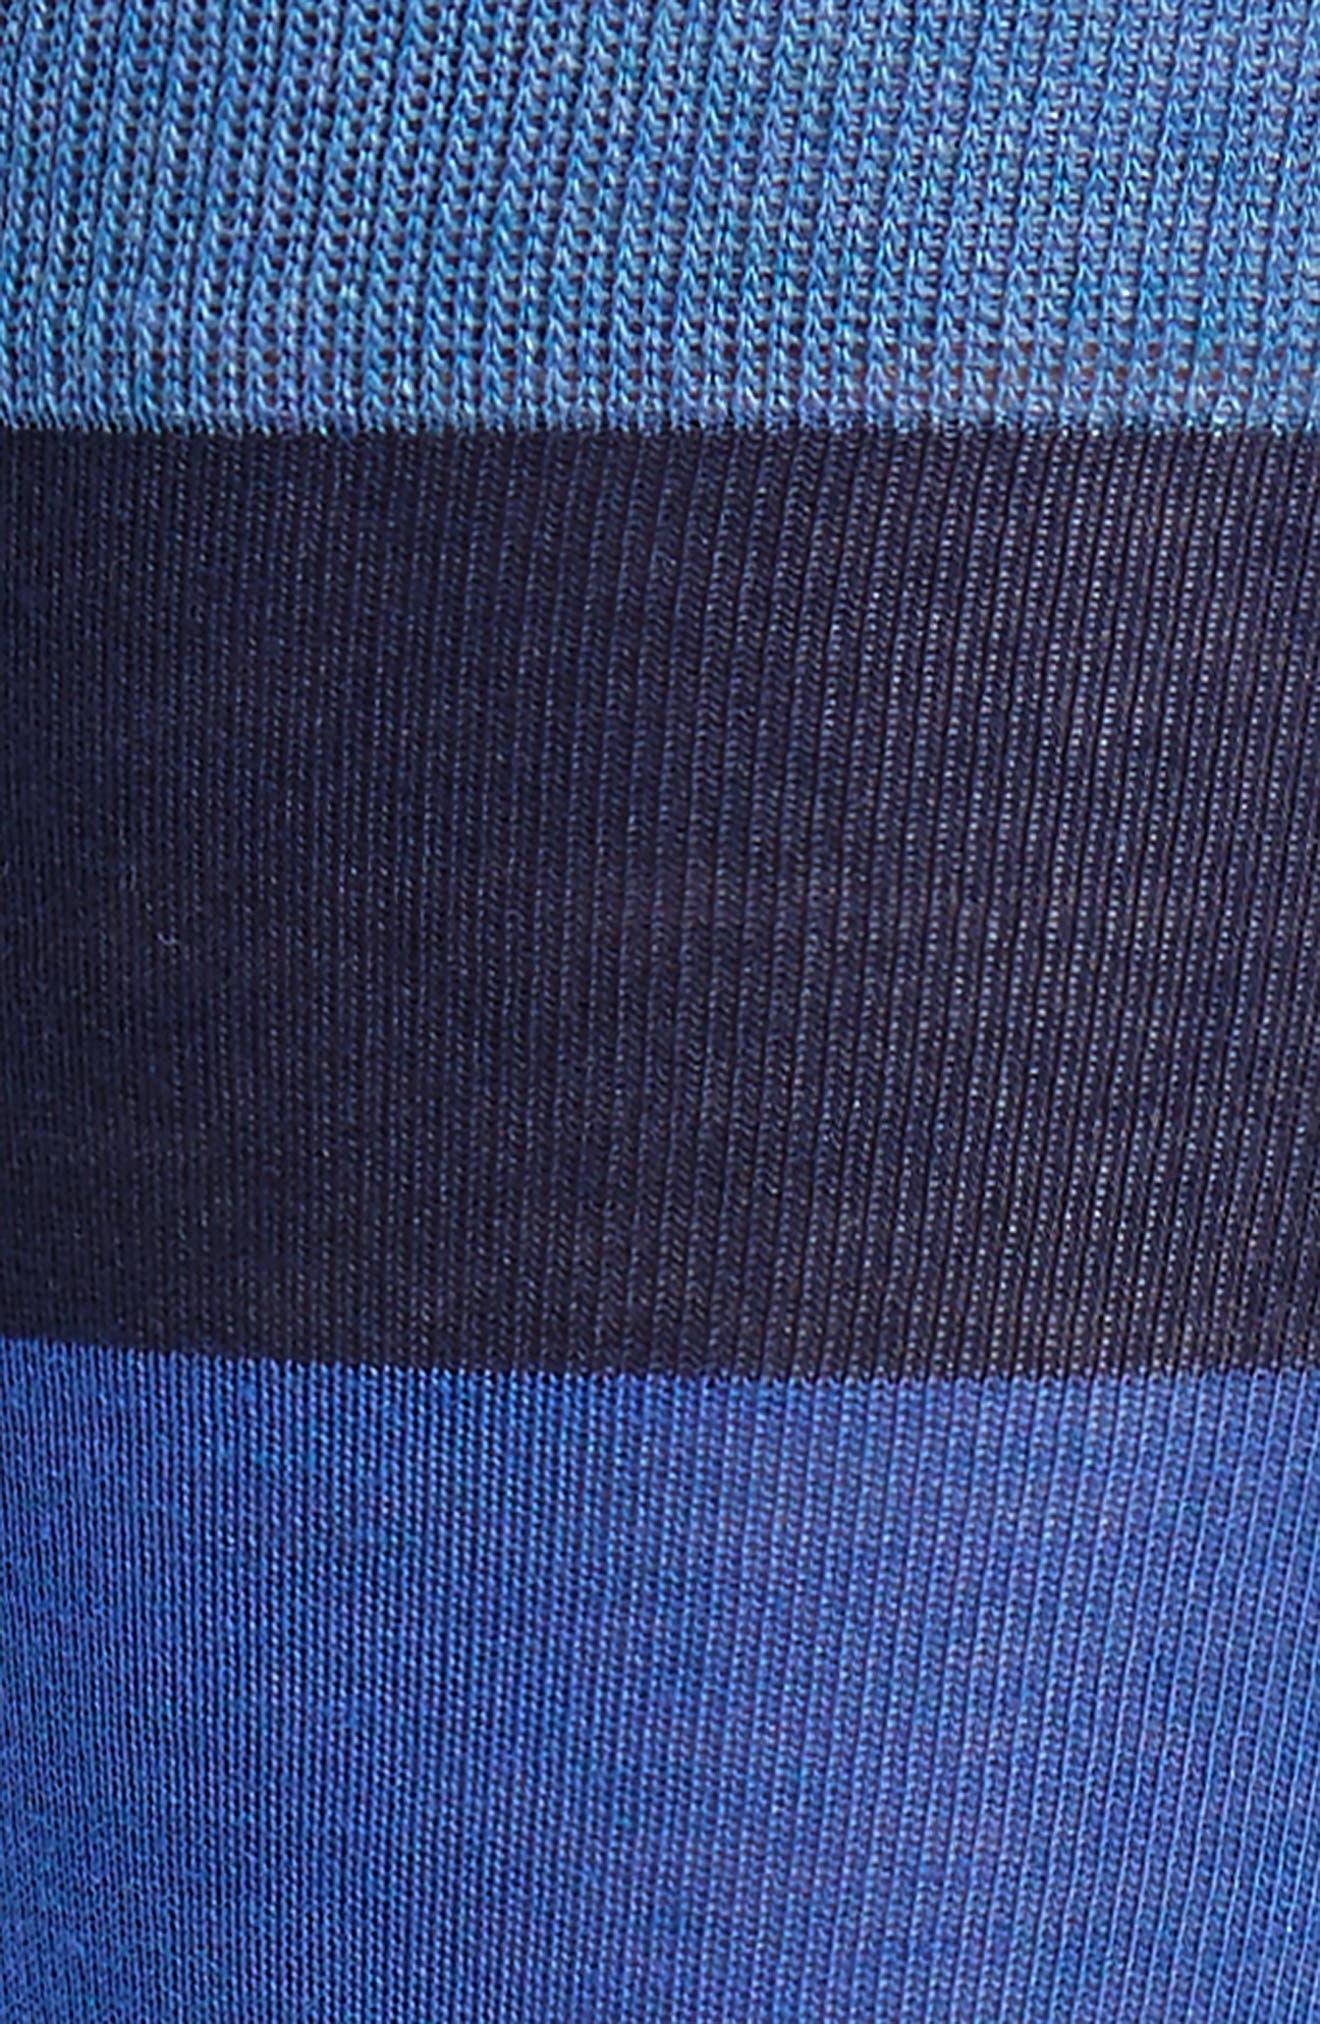 Colorblock Socks,                             Alternate thumbnail 4, color,